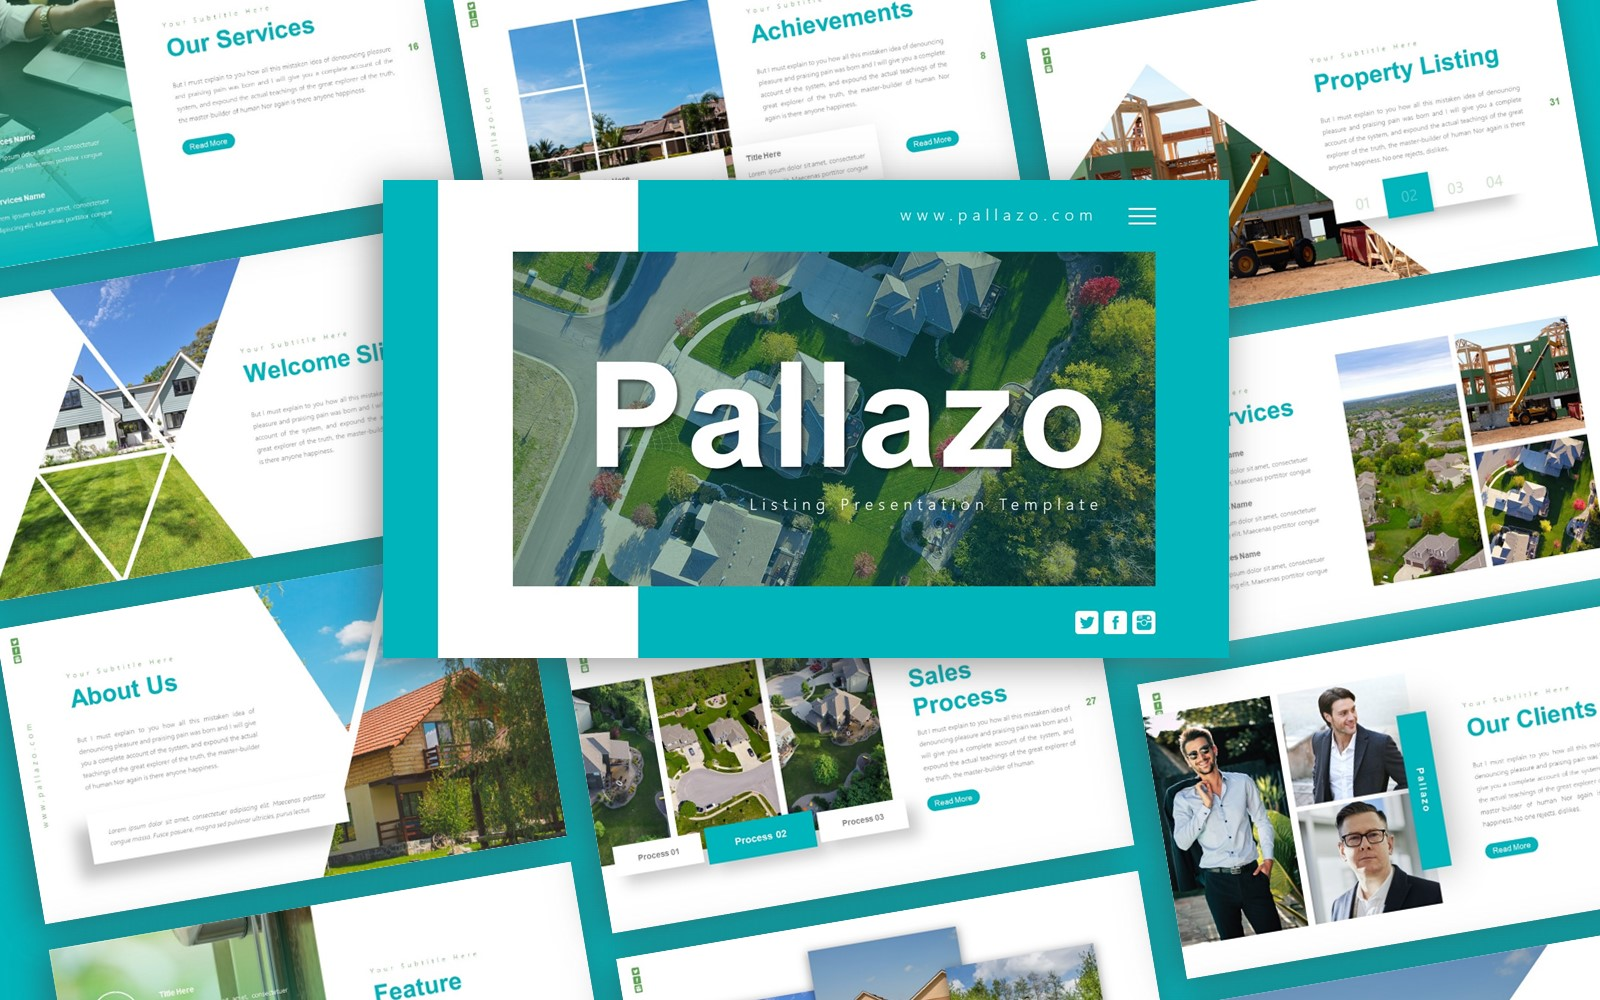 Pallazo Listing Presentation PowerPoint template